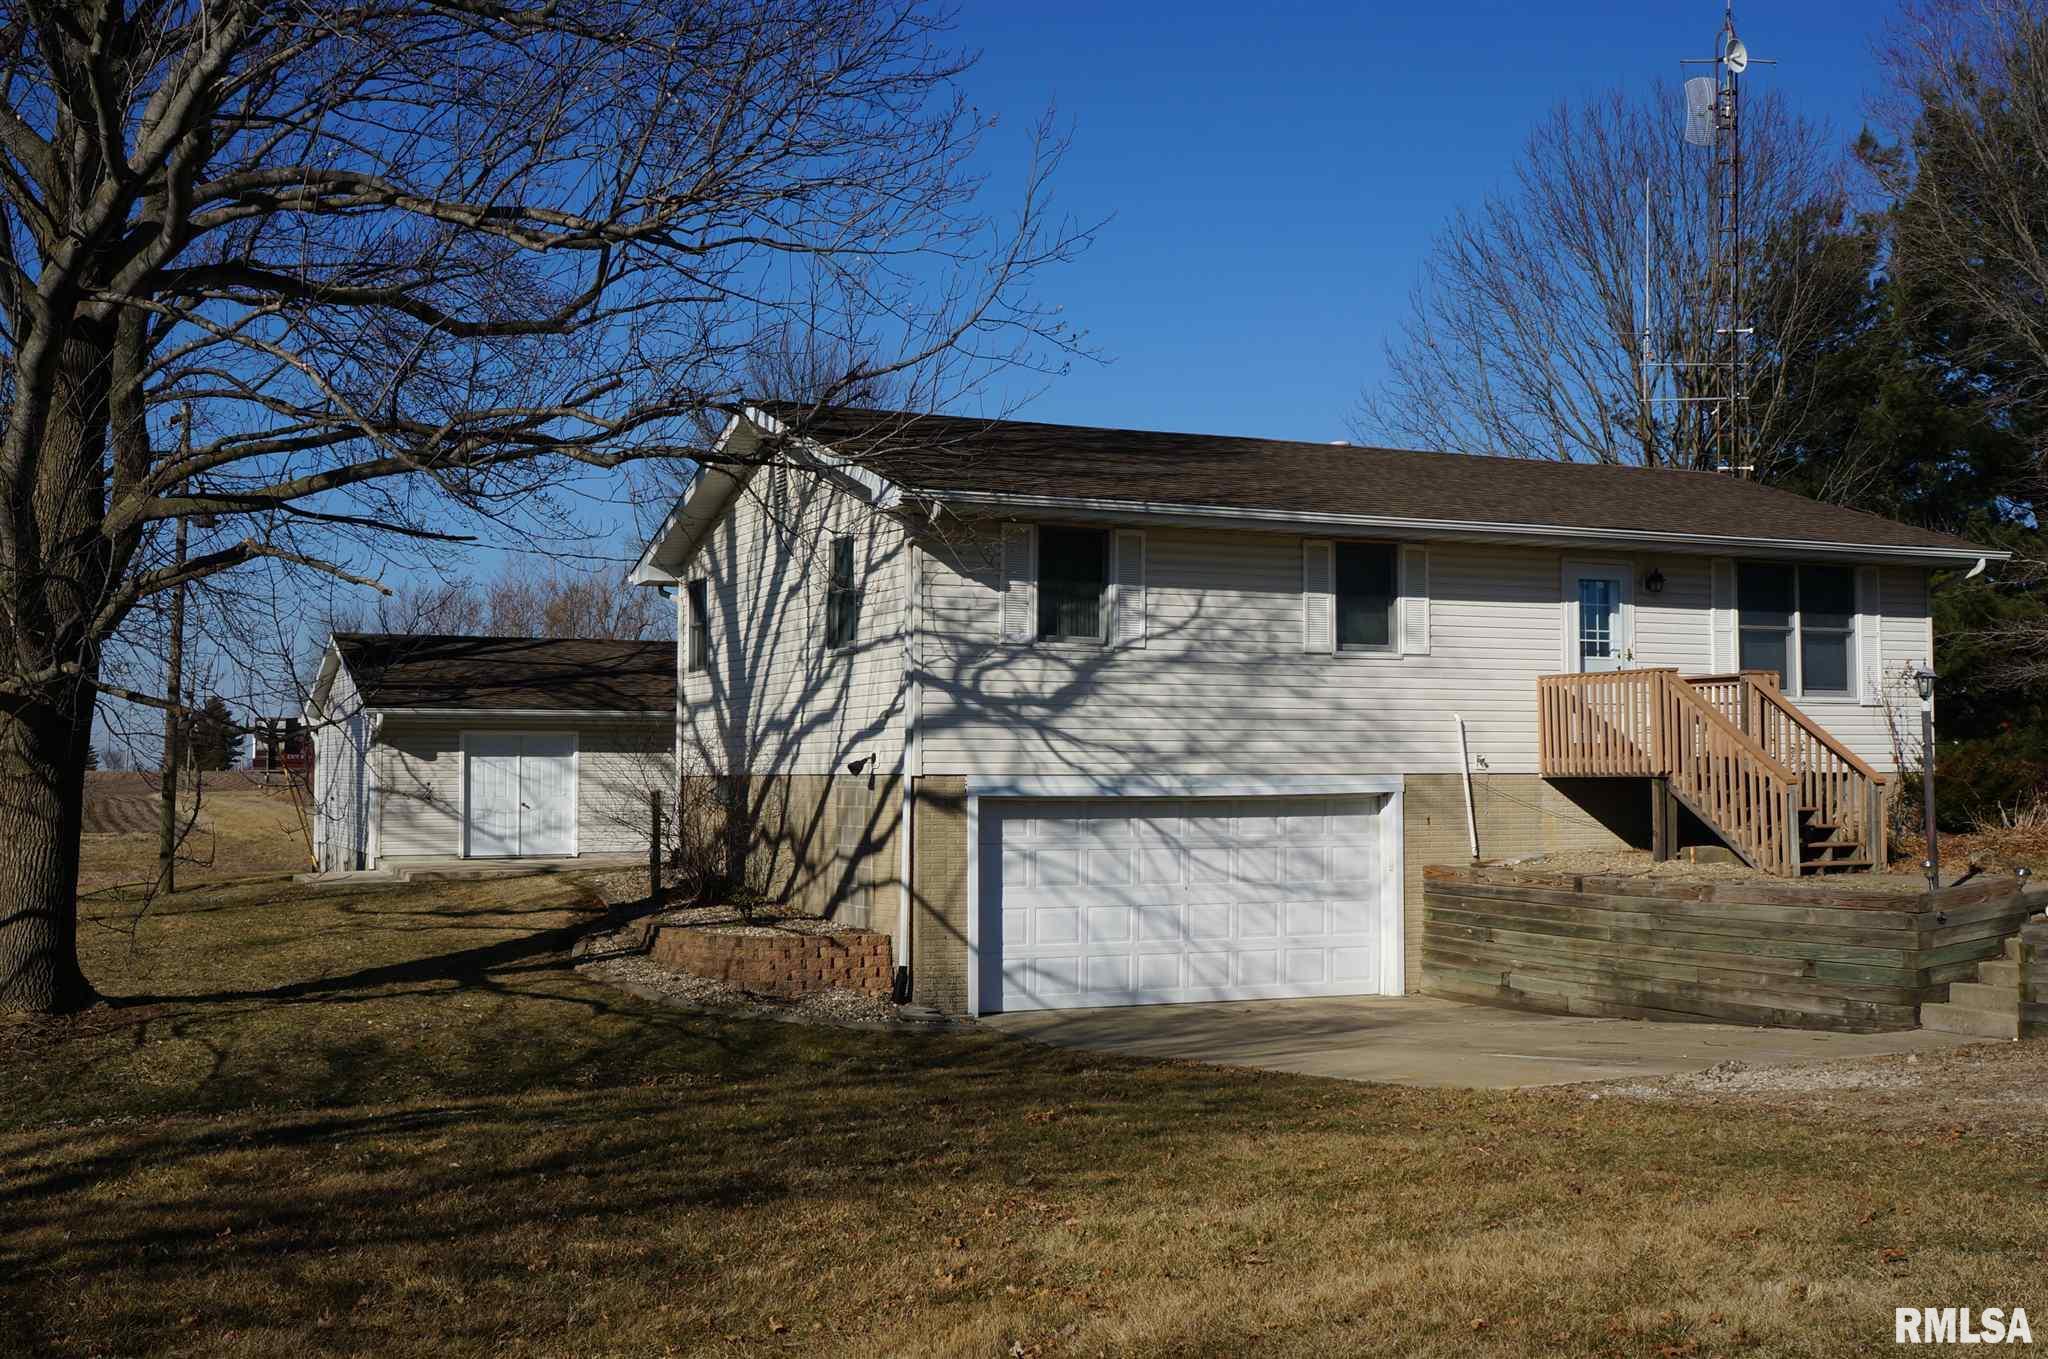 13997 Frazee Property Photo - Divernon, IL real estate listing